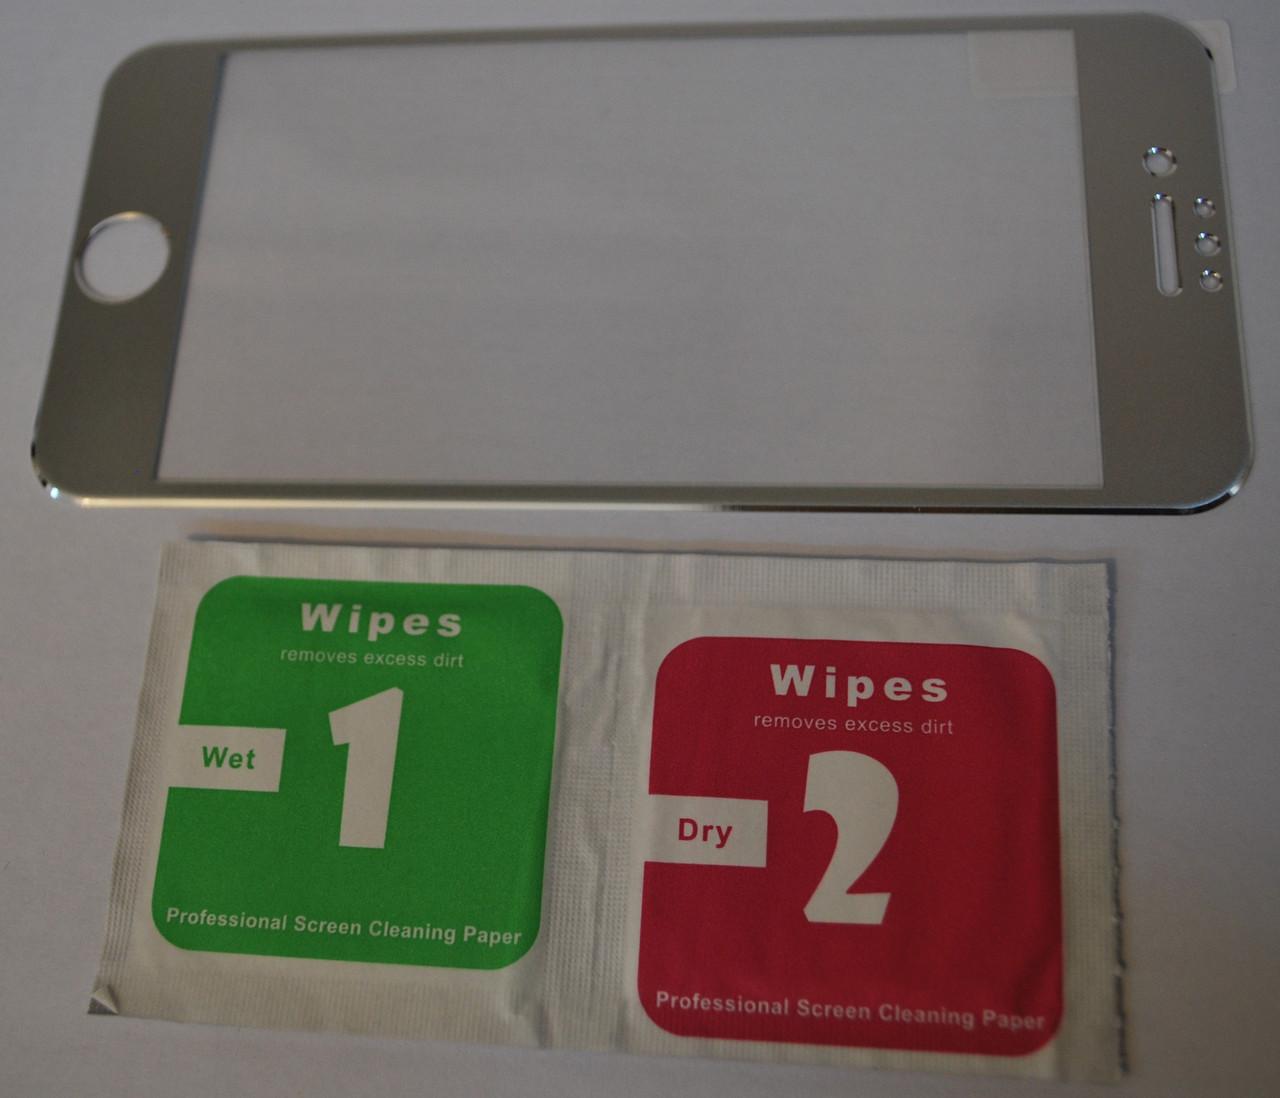 Захисне 3D скло Tempered Glass for IPhone 6 Silver Titanium захисне скло айфон 6, F2119.1